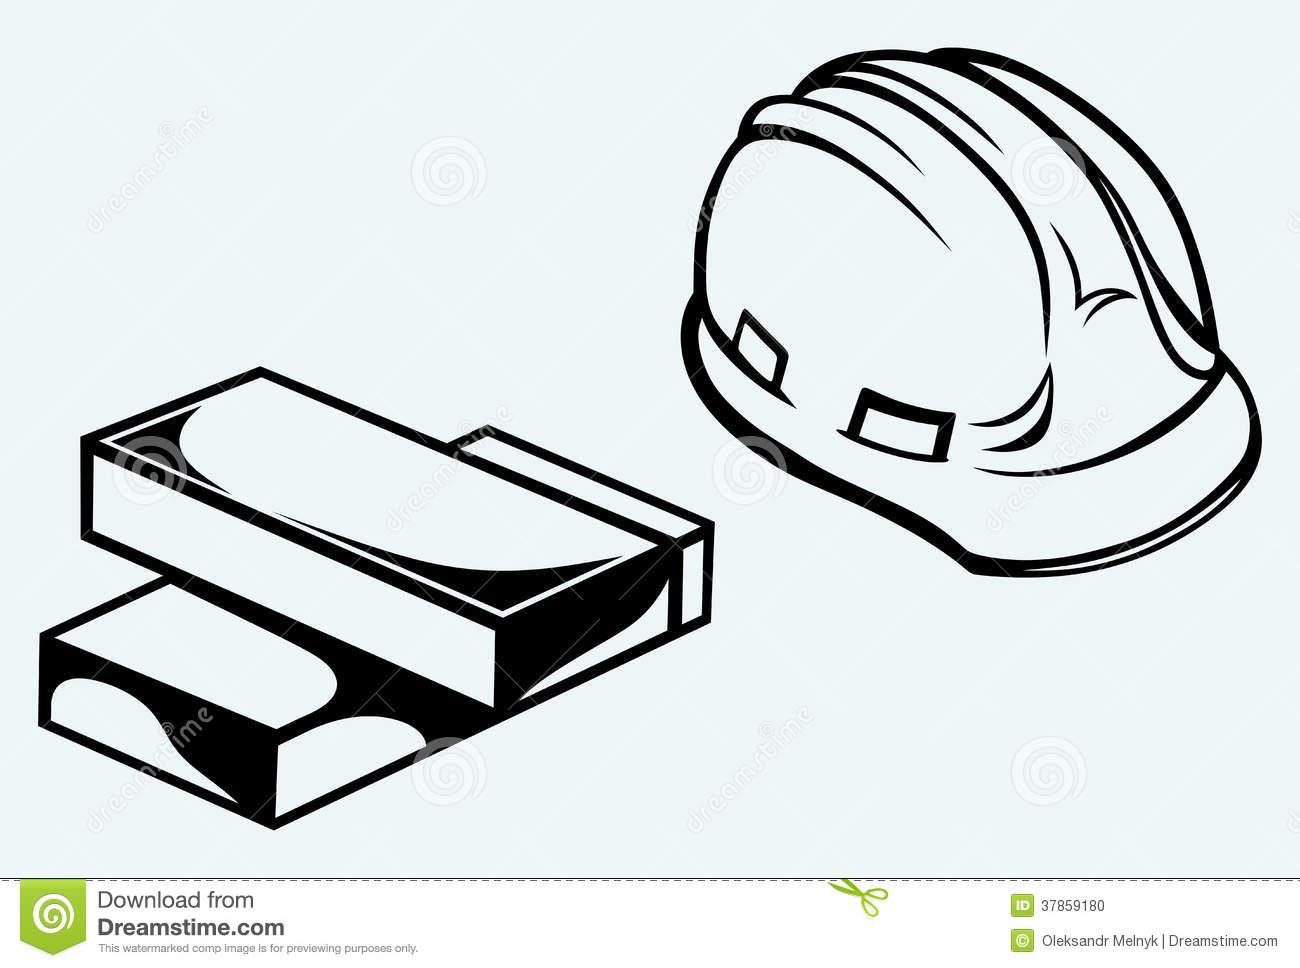 Construction hat clipart silhouette.